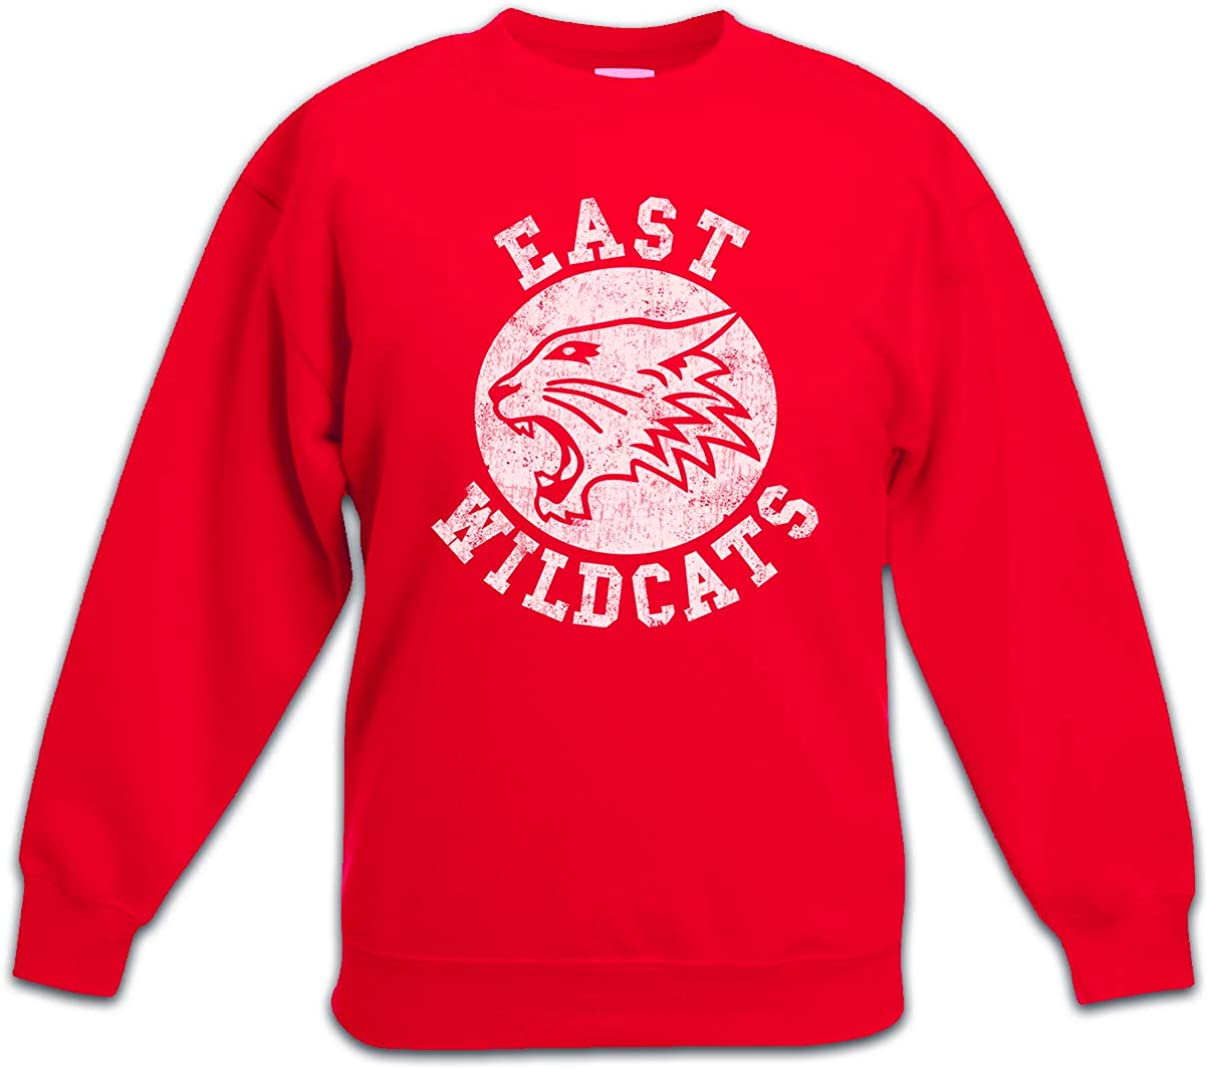 Urban Backwoods East Wildcats Sudadera Suéter para Niños Niñas Pullover